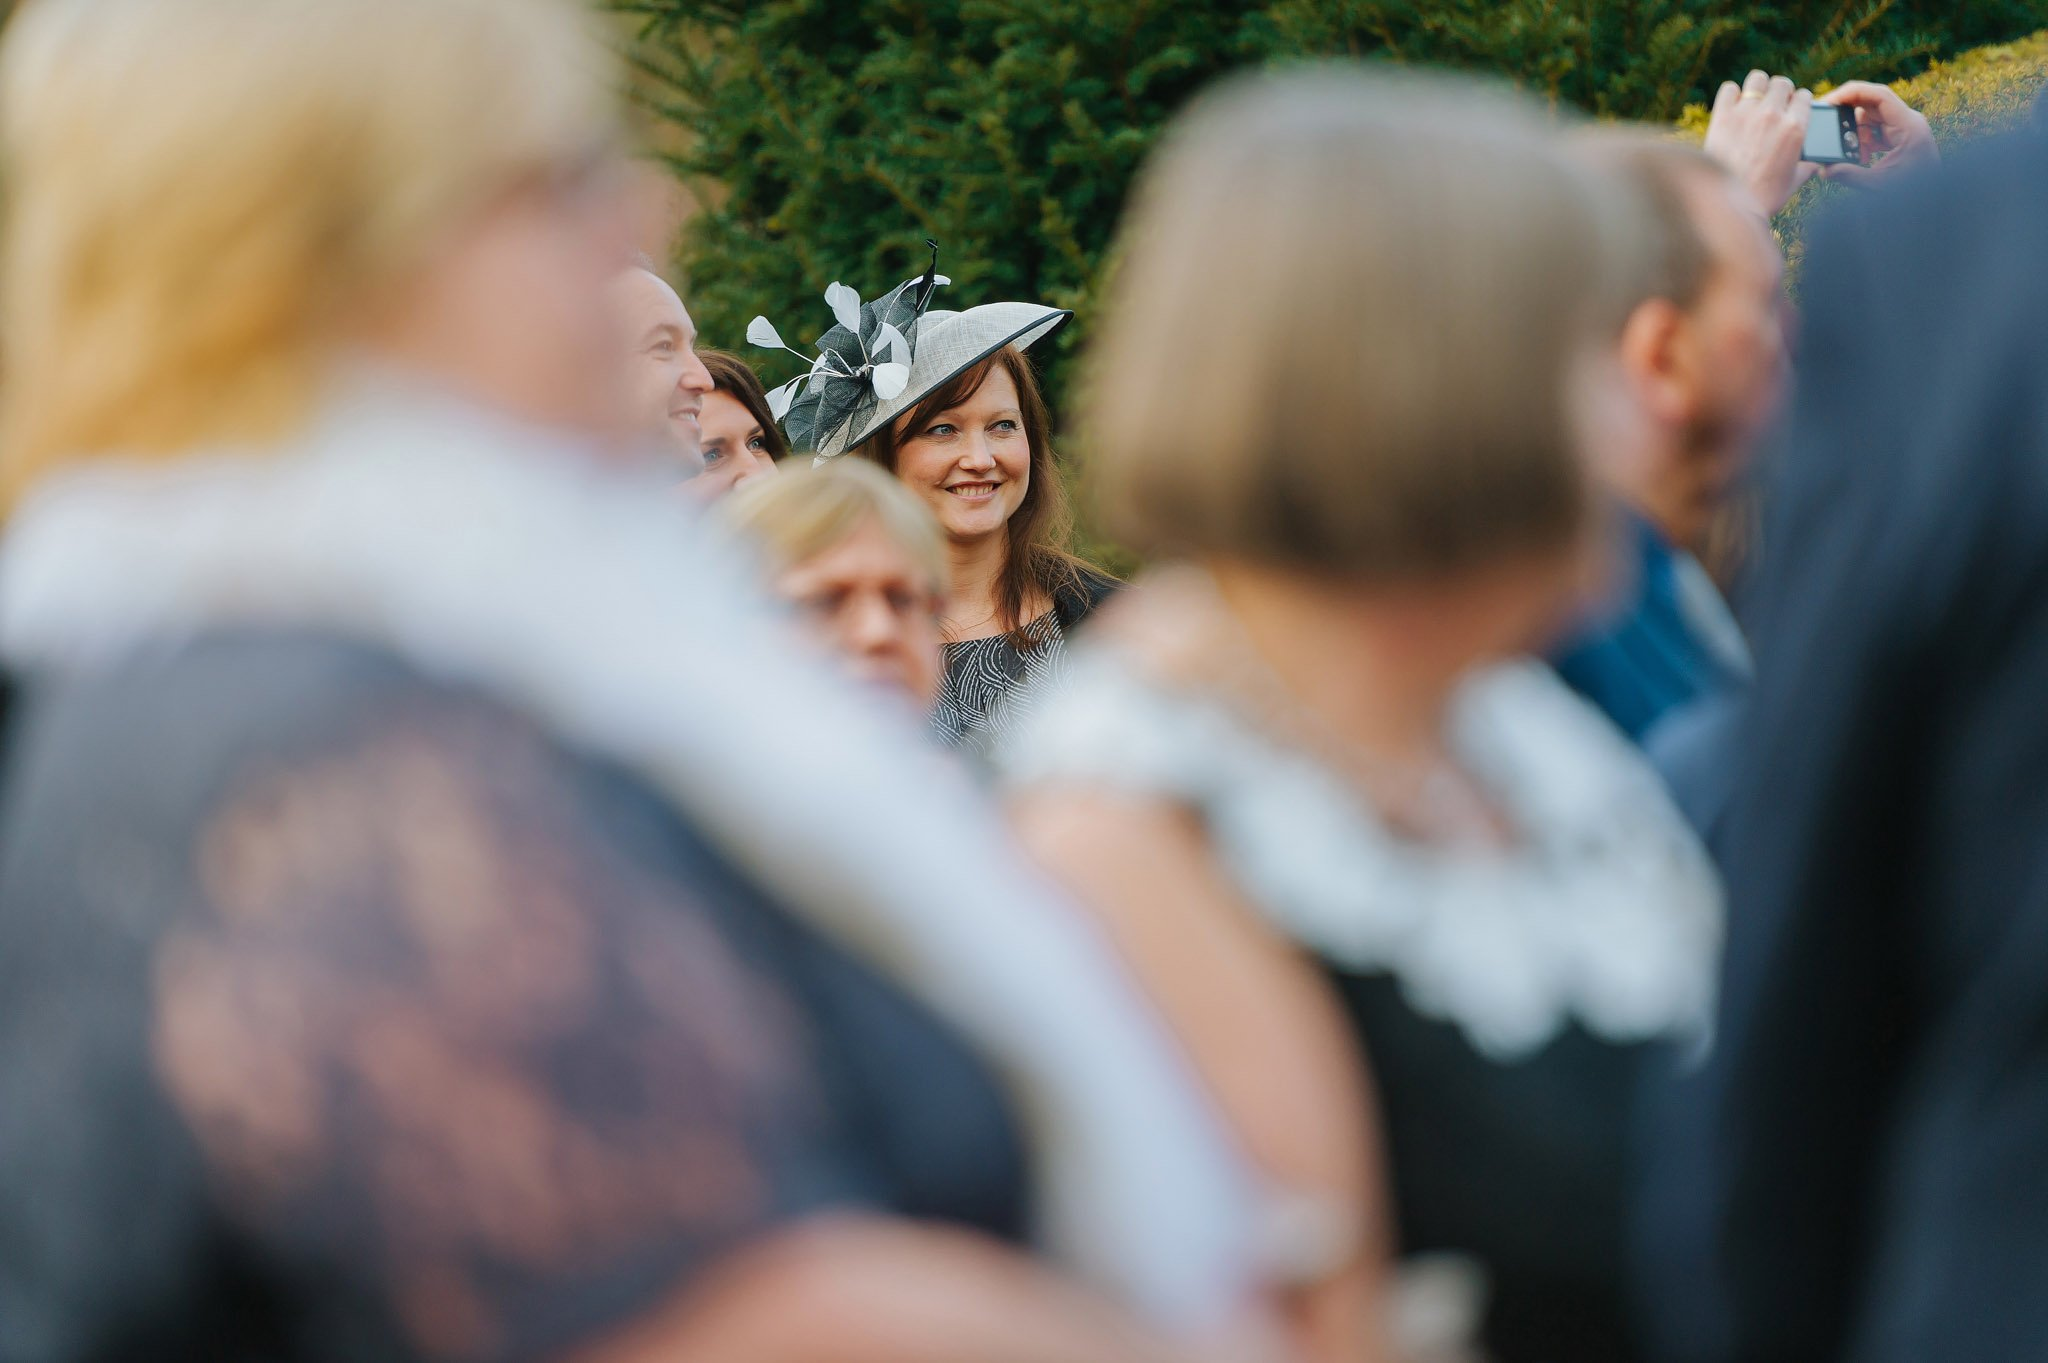 Coombe Abbey wedding in Coventry, Warwickshire - Sam + Matt 33